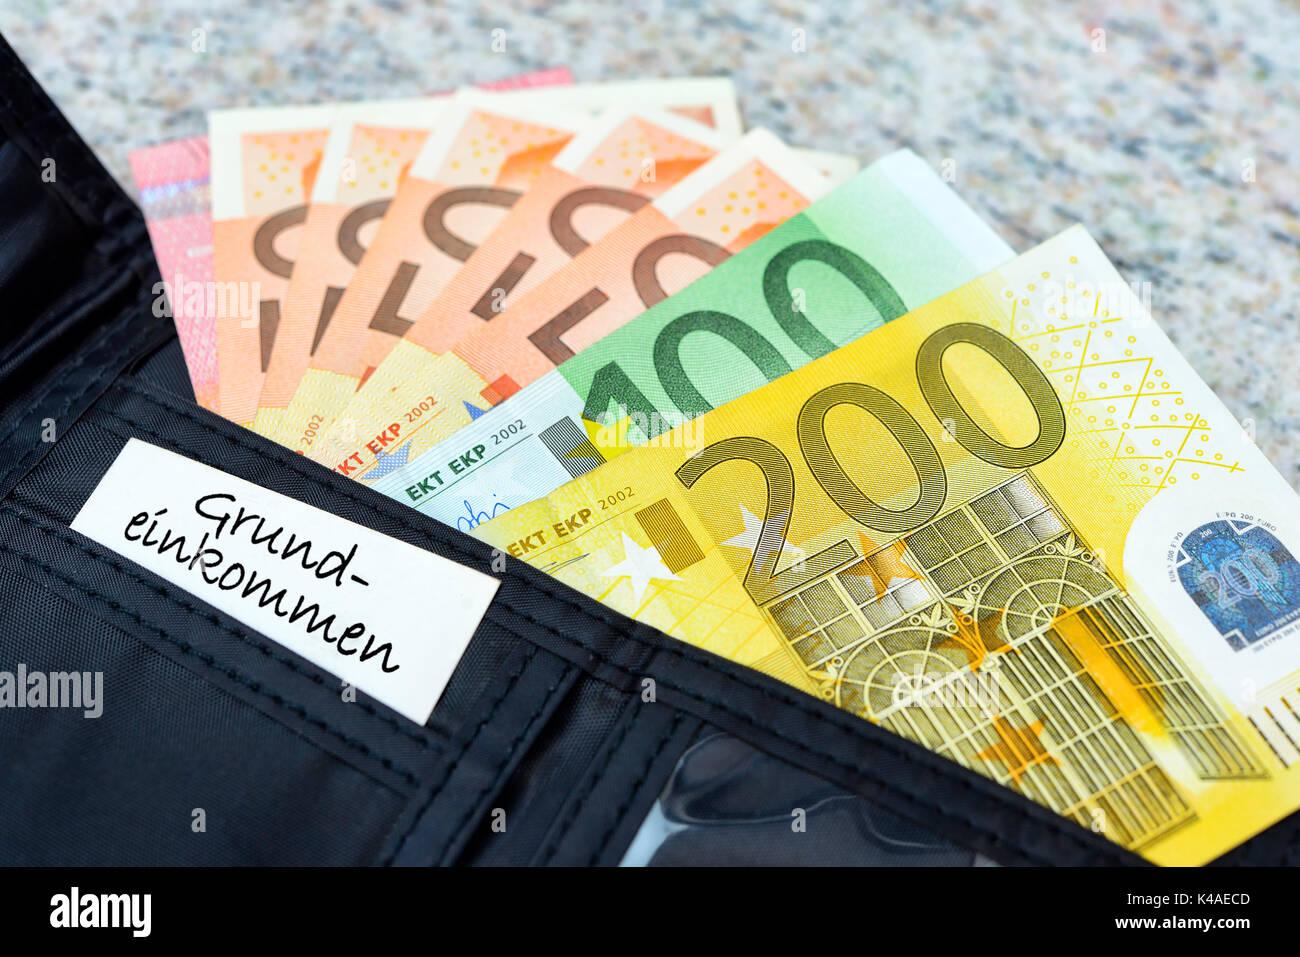 Basic Income - Stock Image